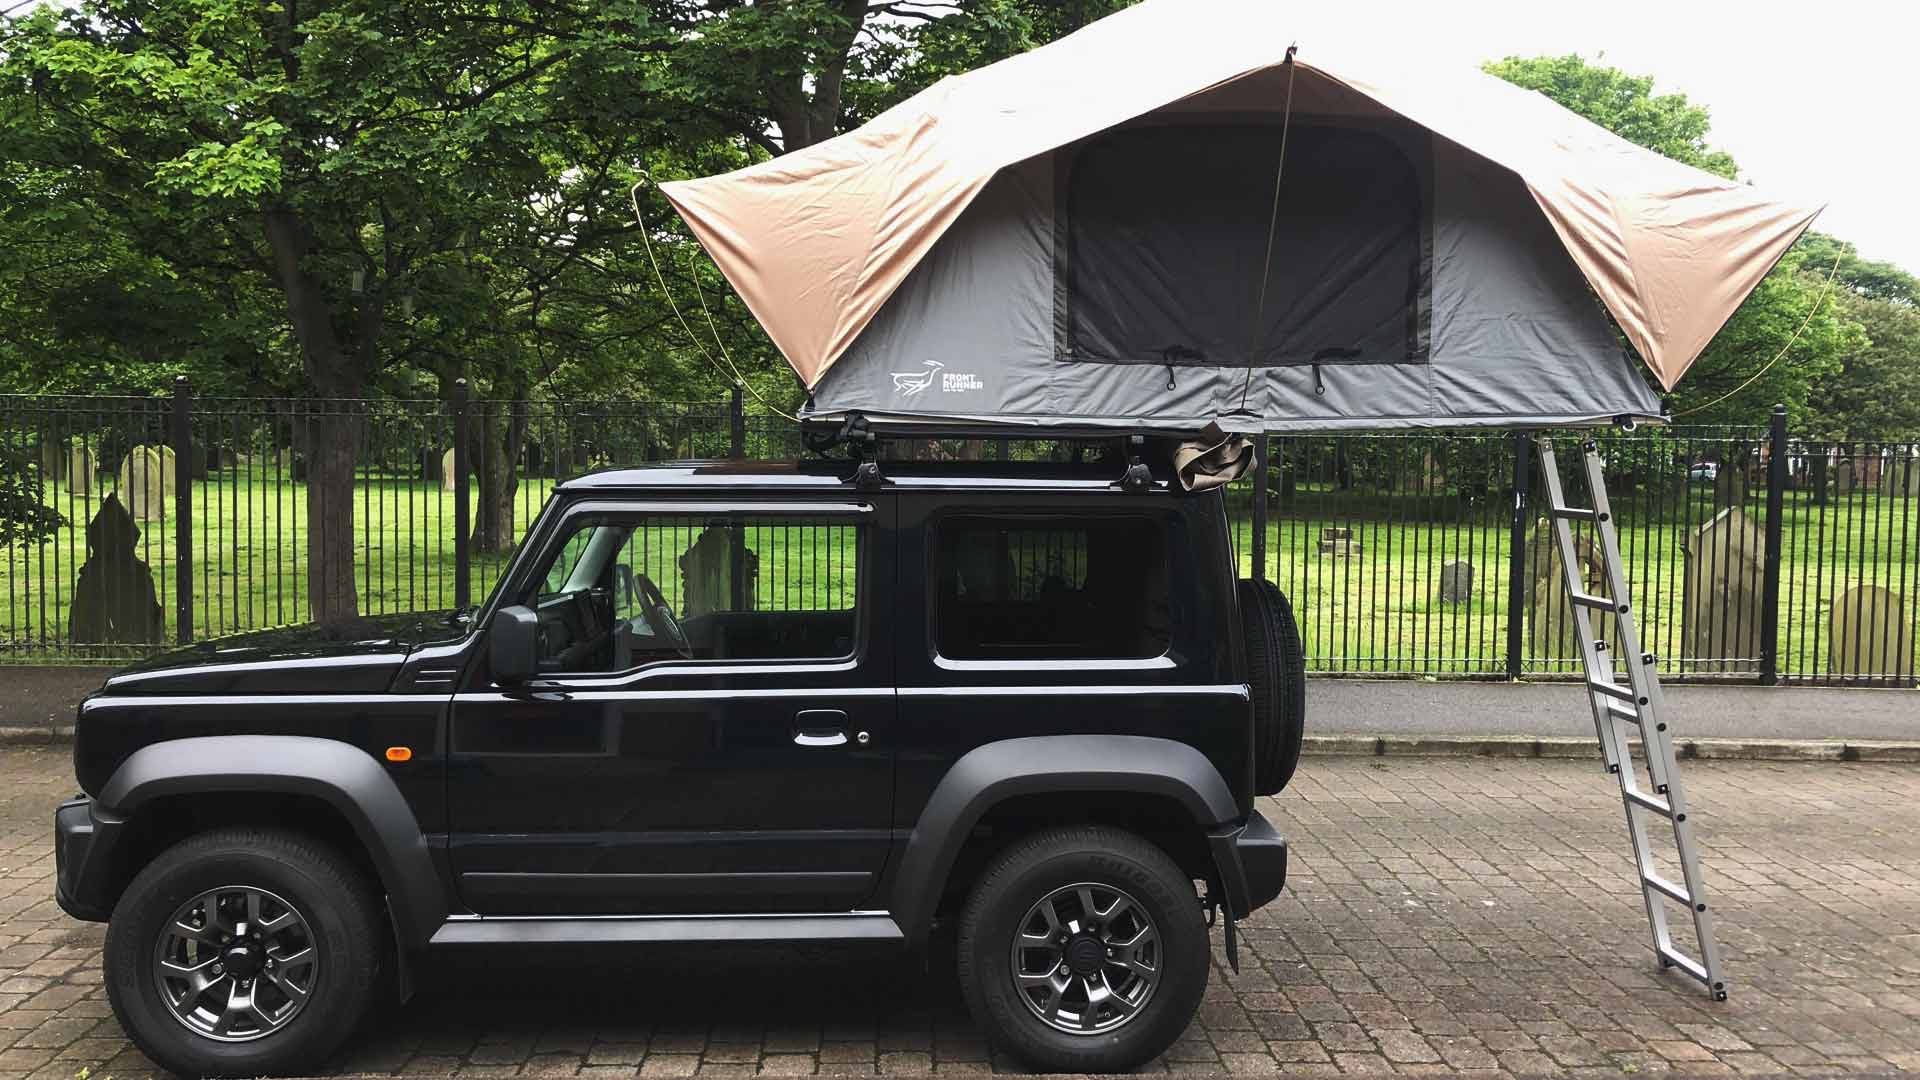 suzuki jimny roof tent